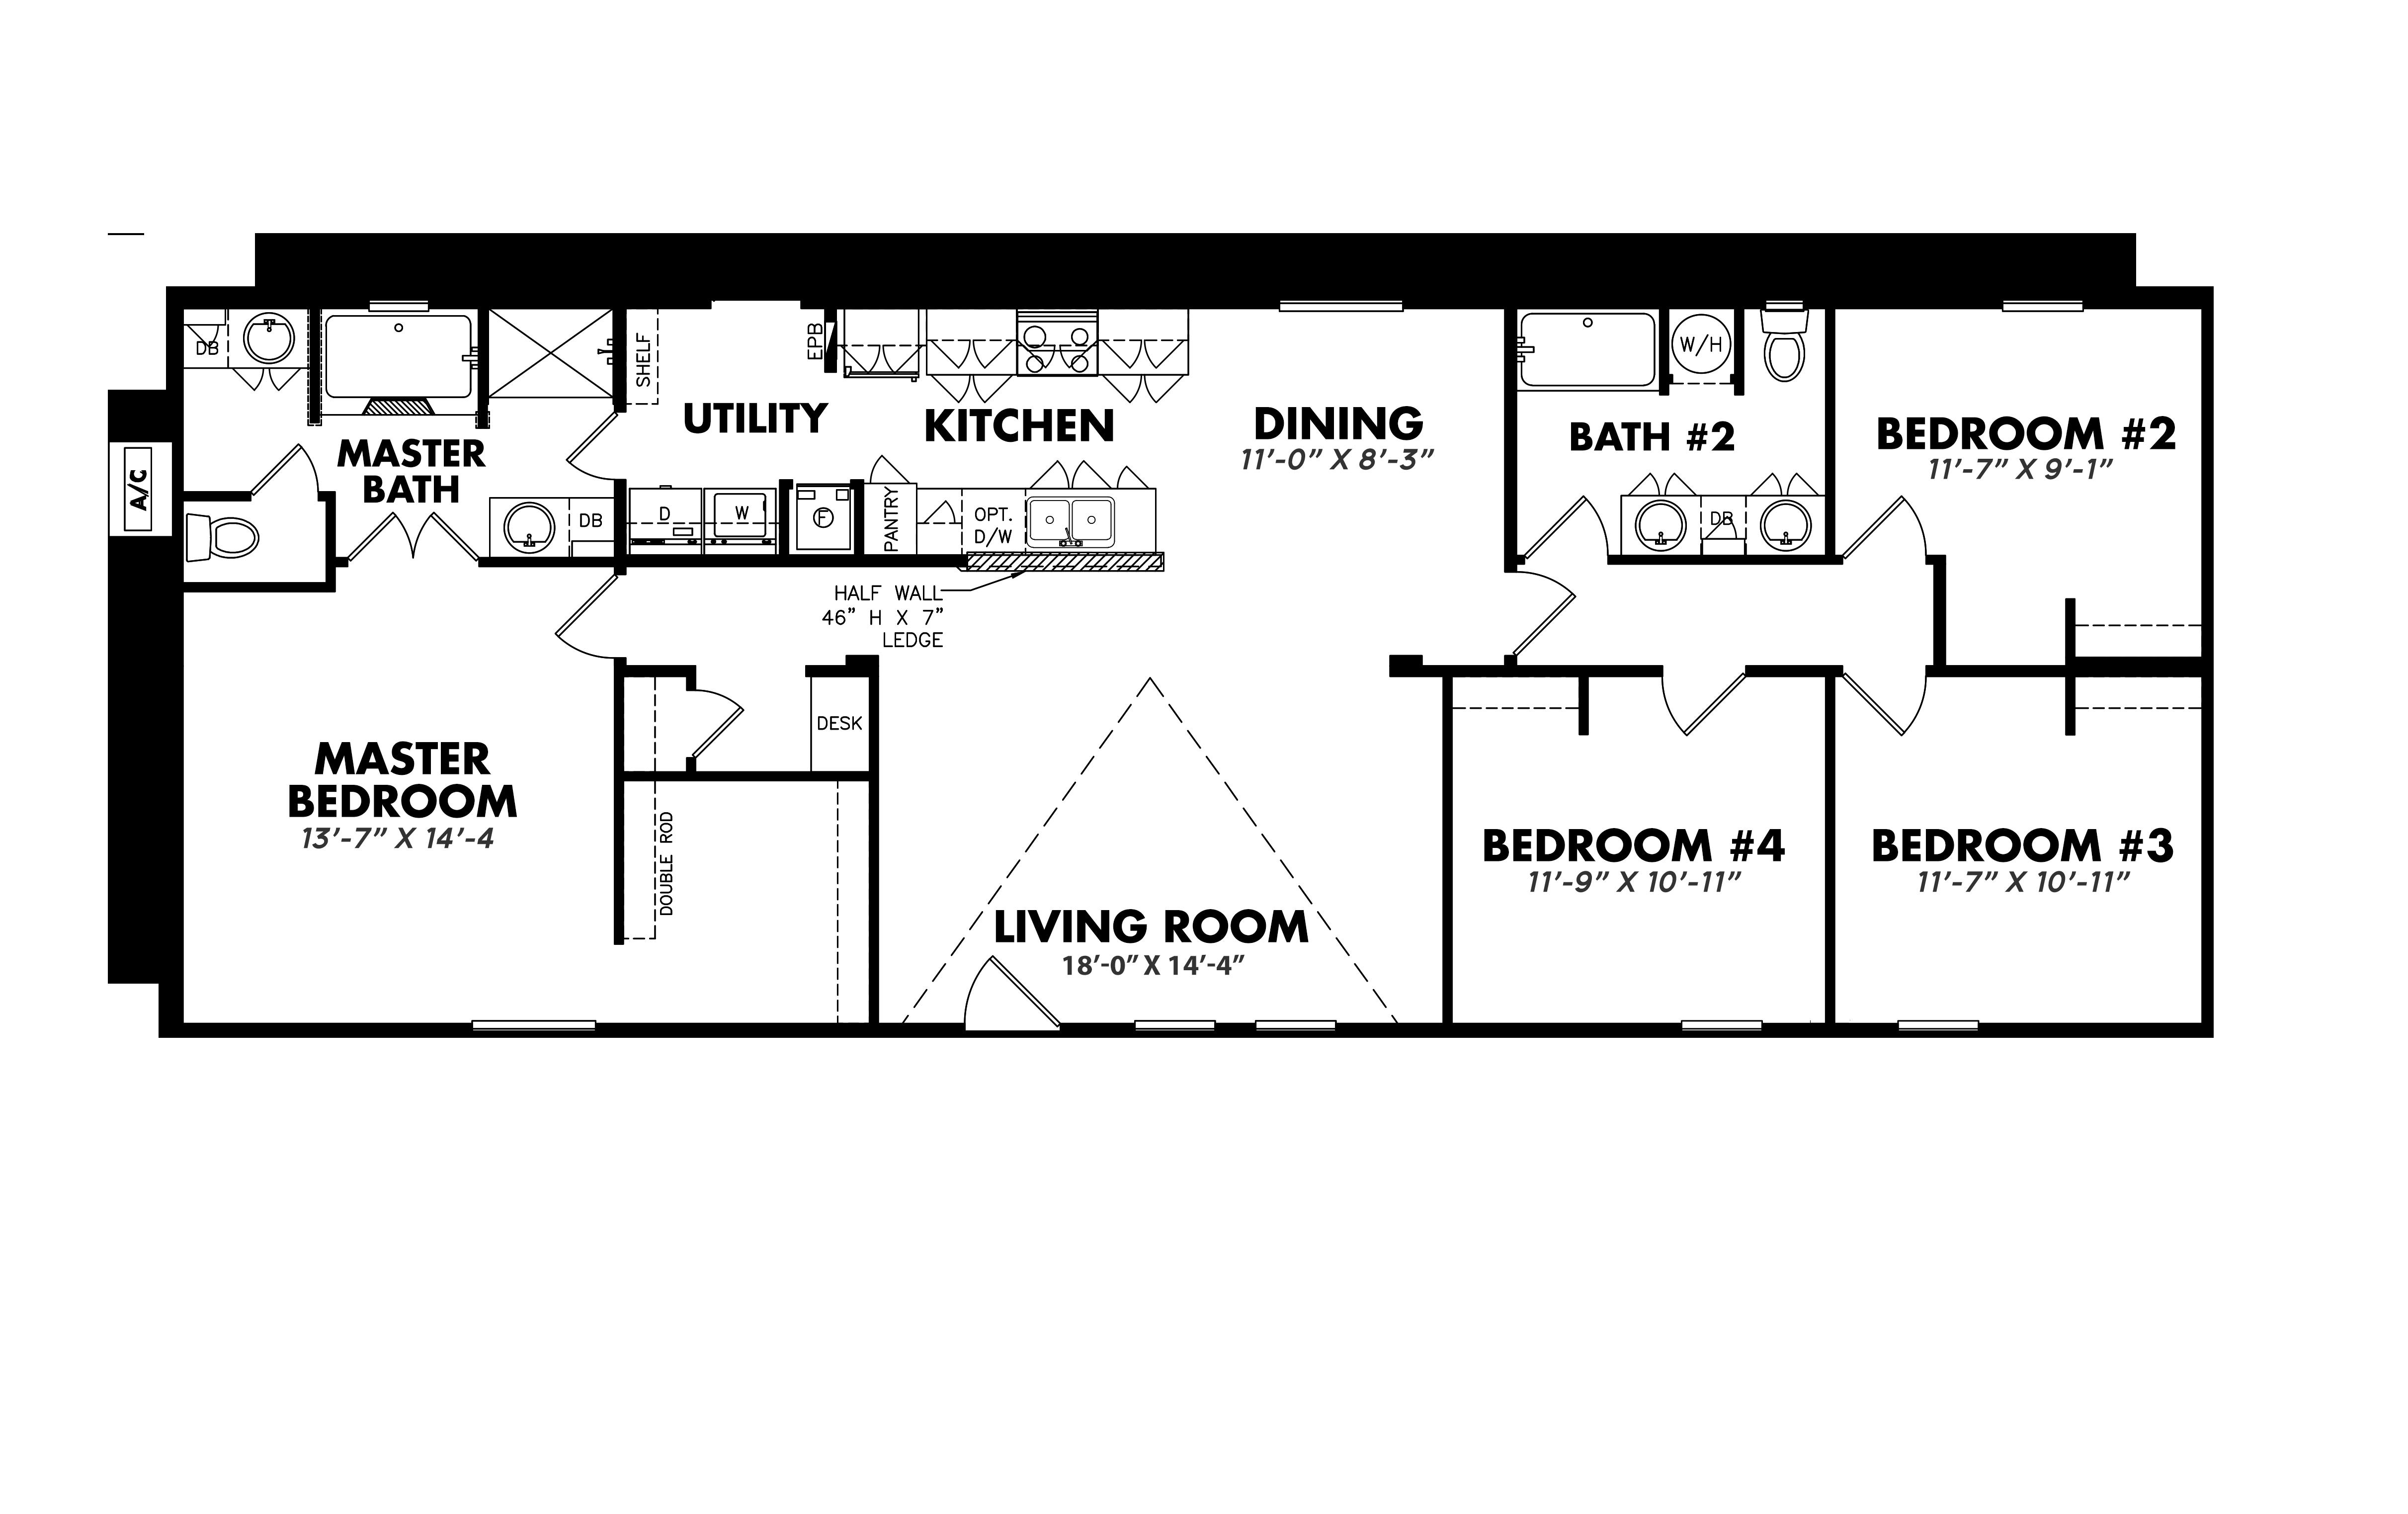 Floorplan of Legacy Housing Model # S-2468-42A